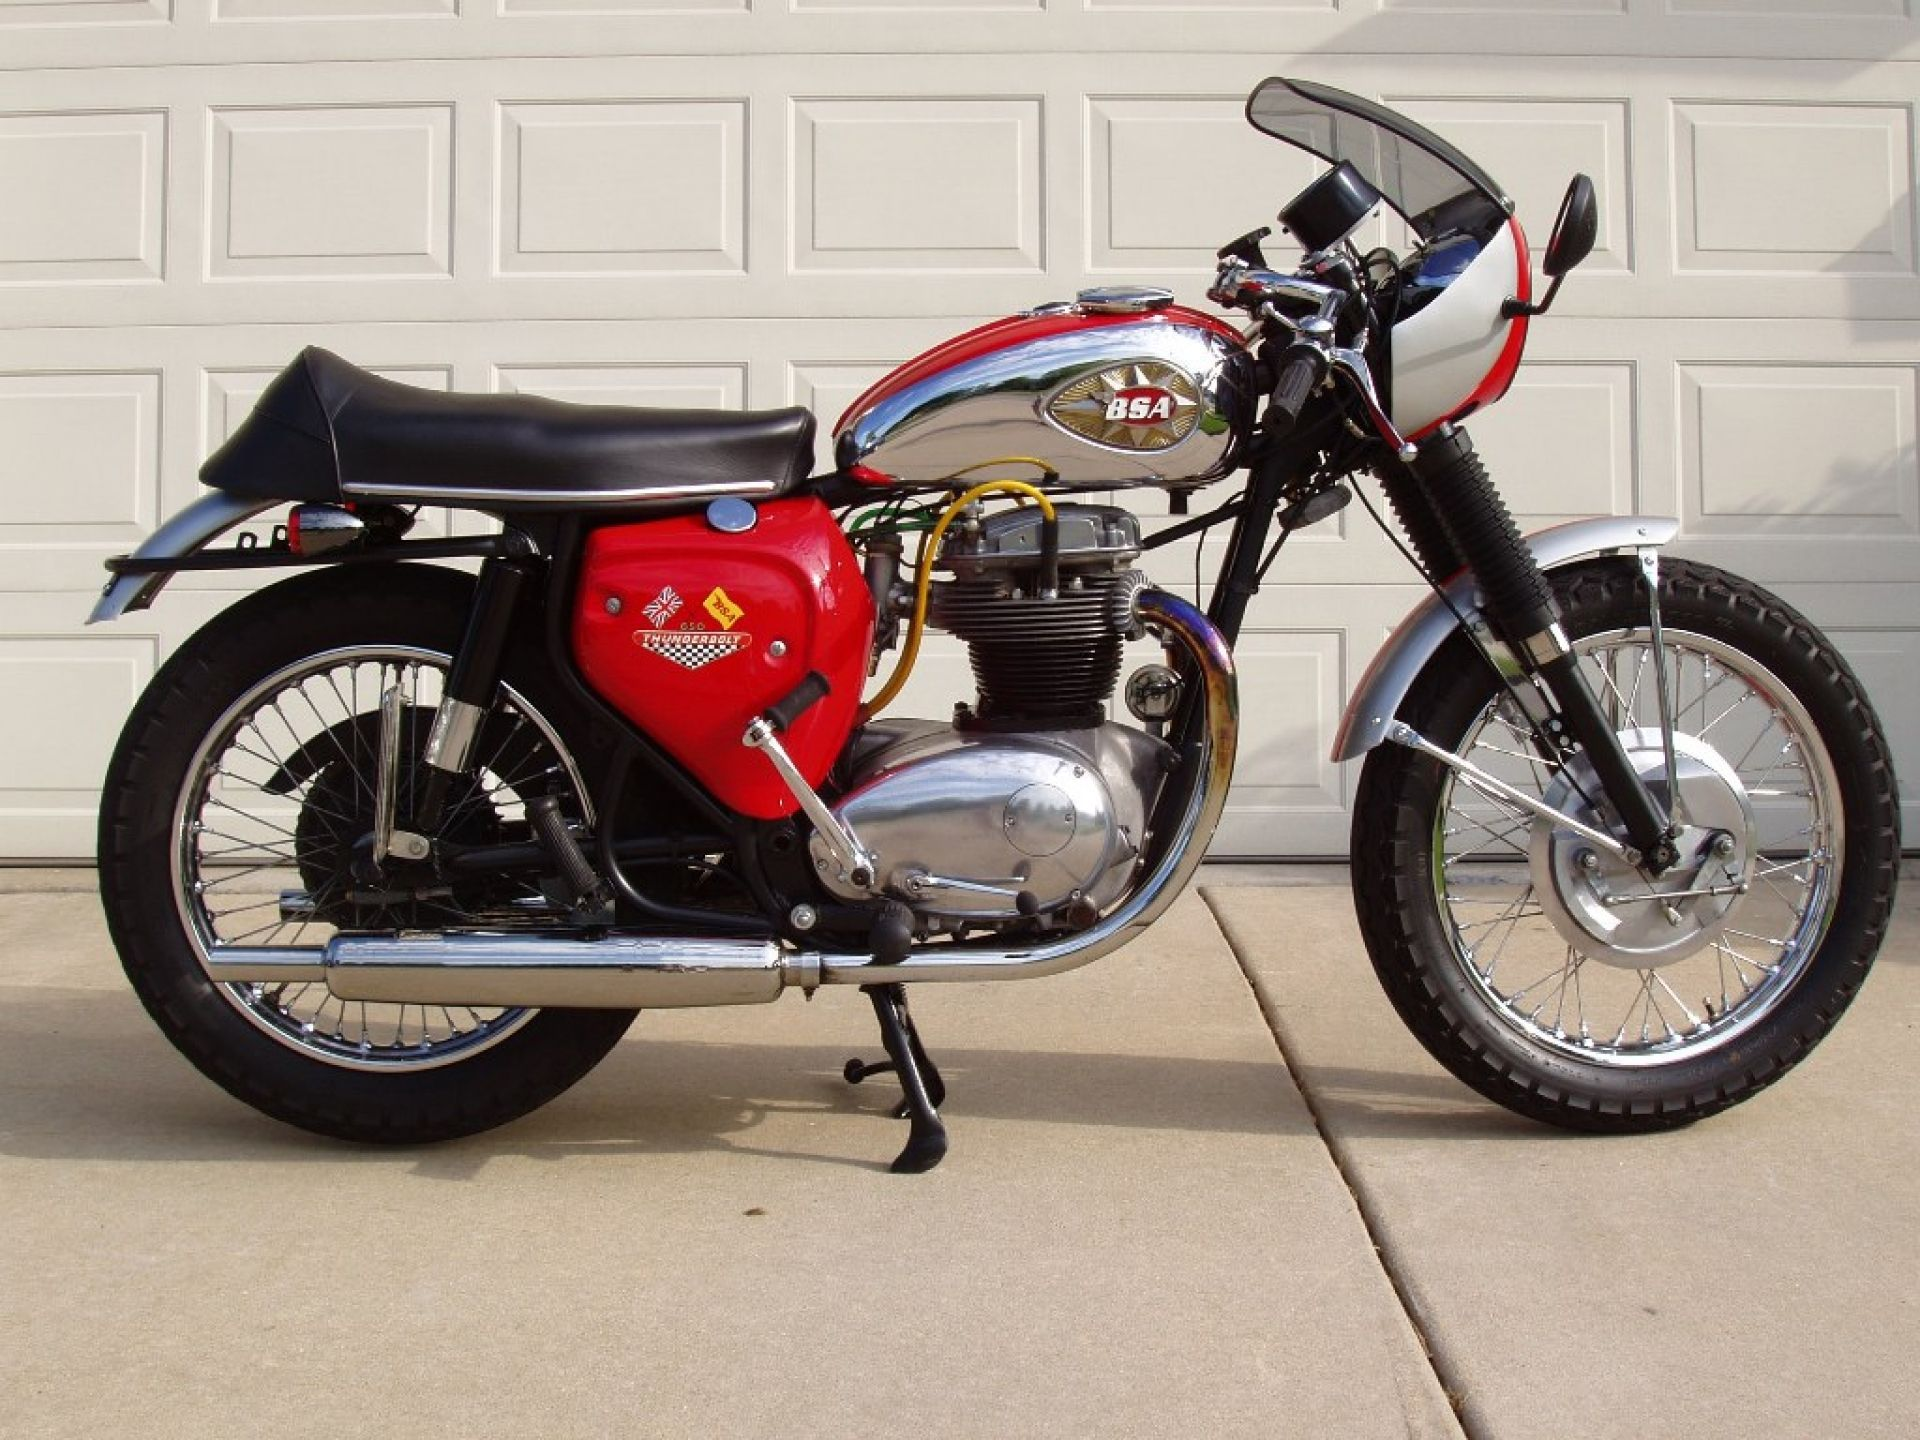 Bsa thunderbolt 650 pipeburn purveyors of classic motorcycles cafe racers custom motorbikes